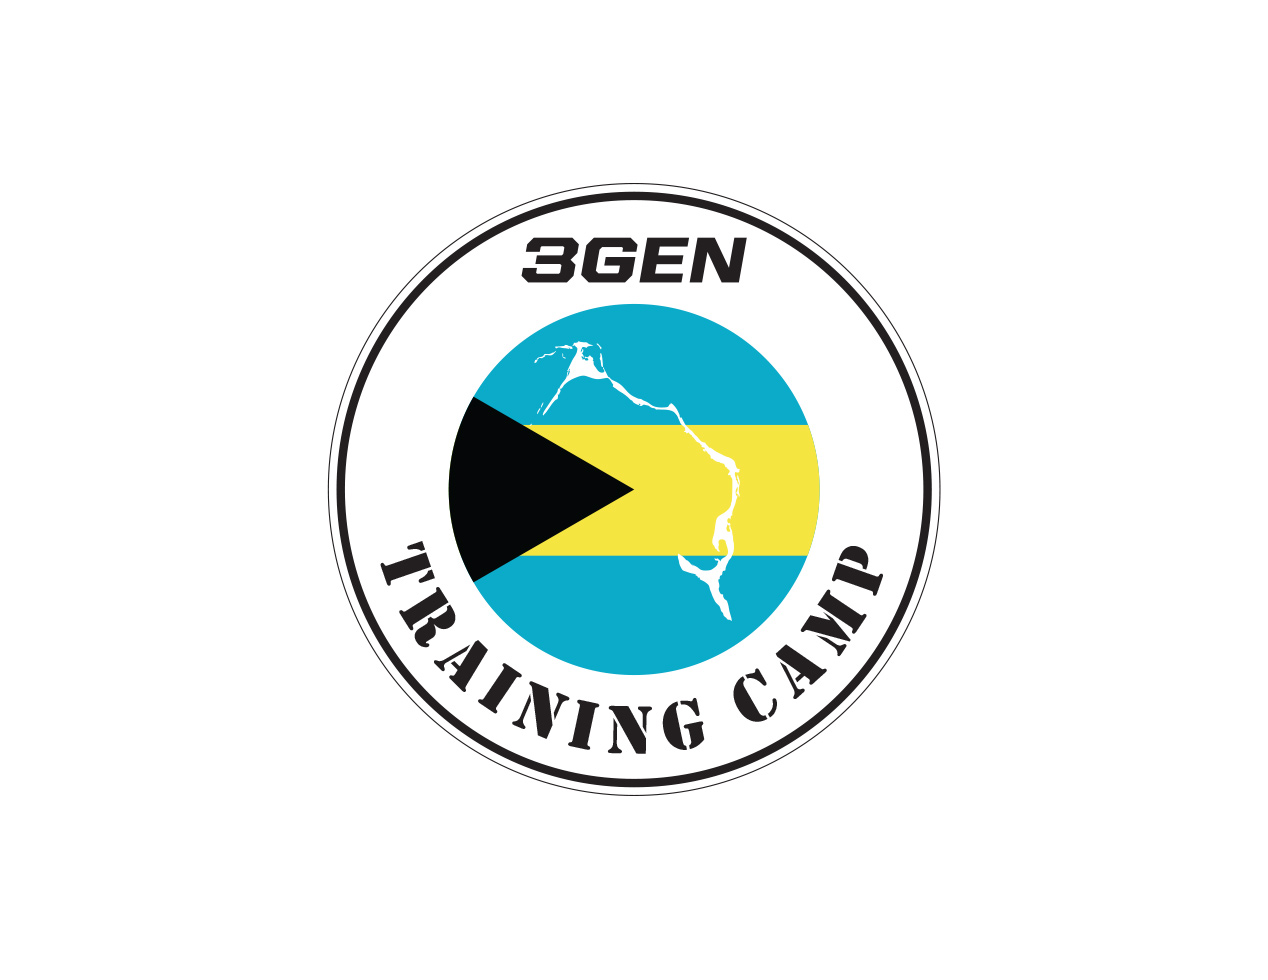 3gen-training-camp.jpg